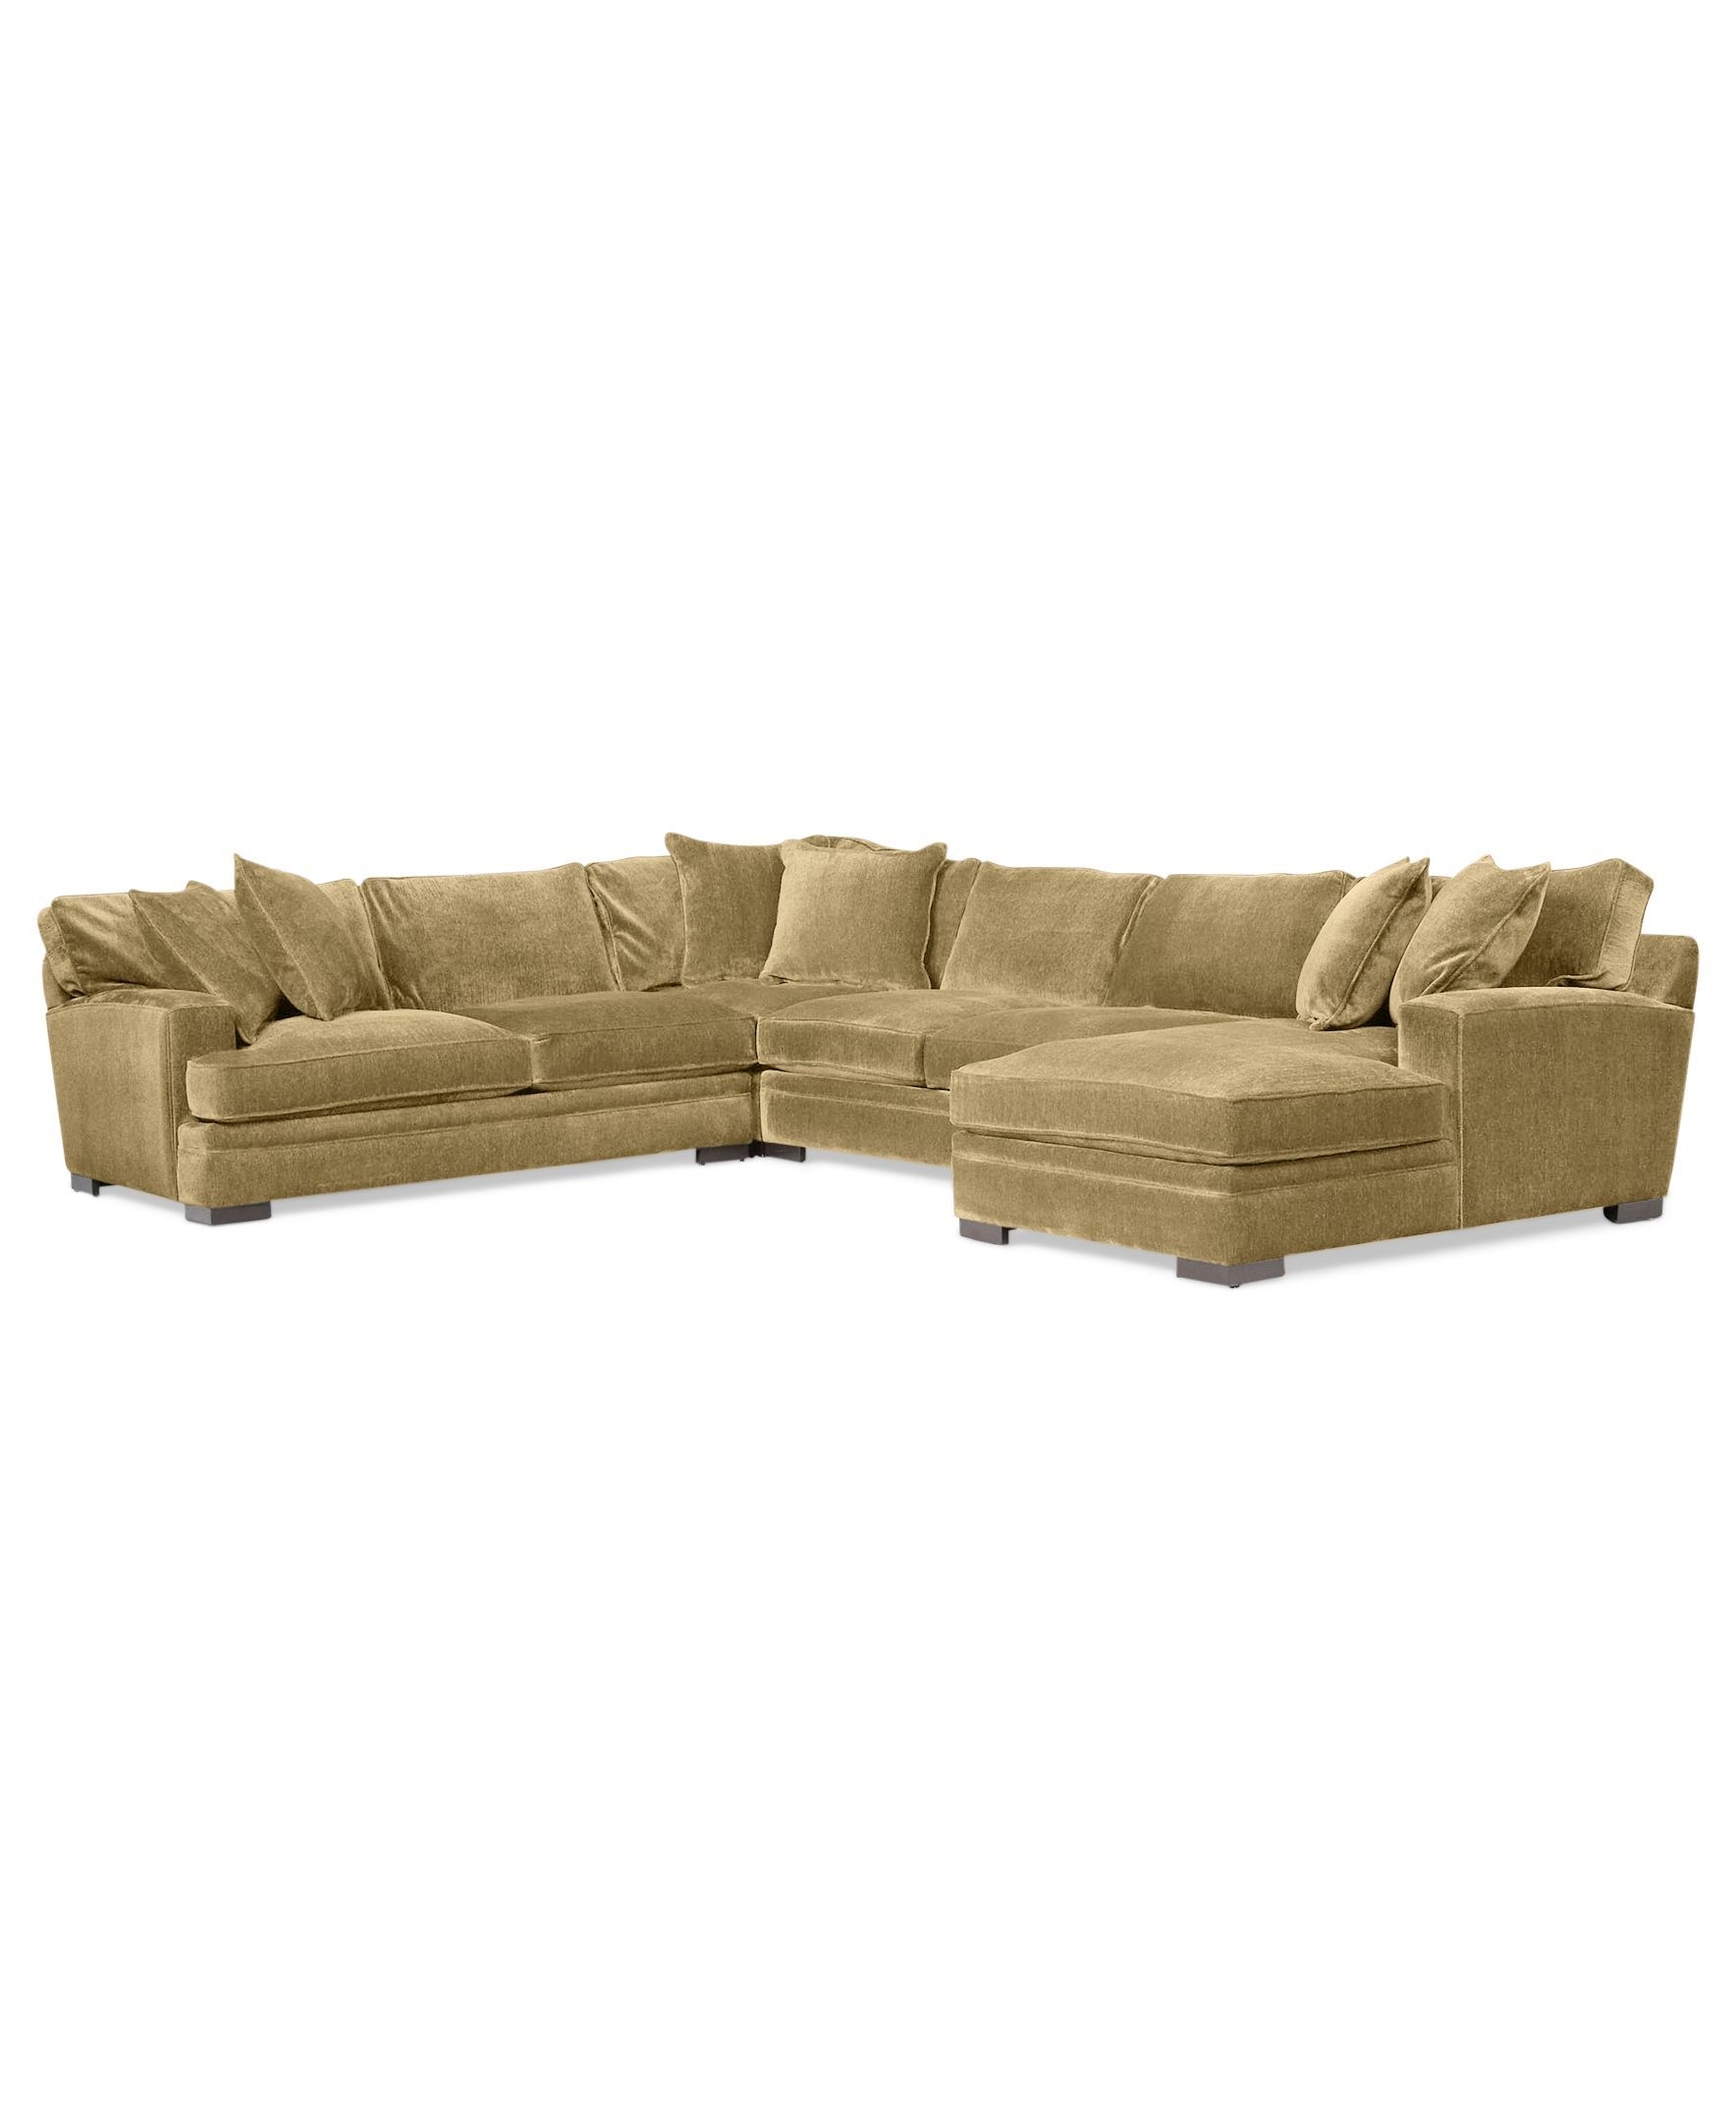 Teddy Fabric 4 Piece Chaise Sectional Sofa Custom Colors